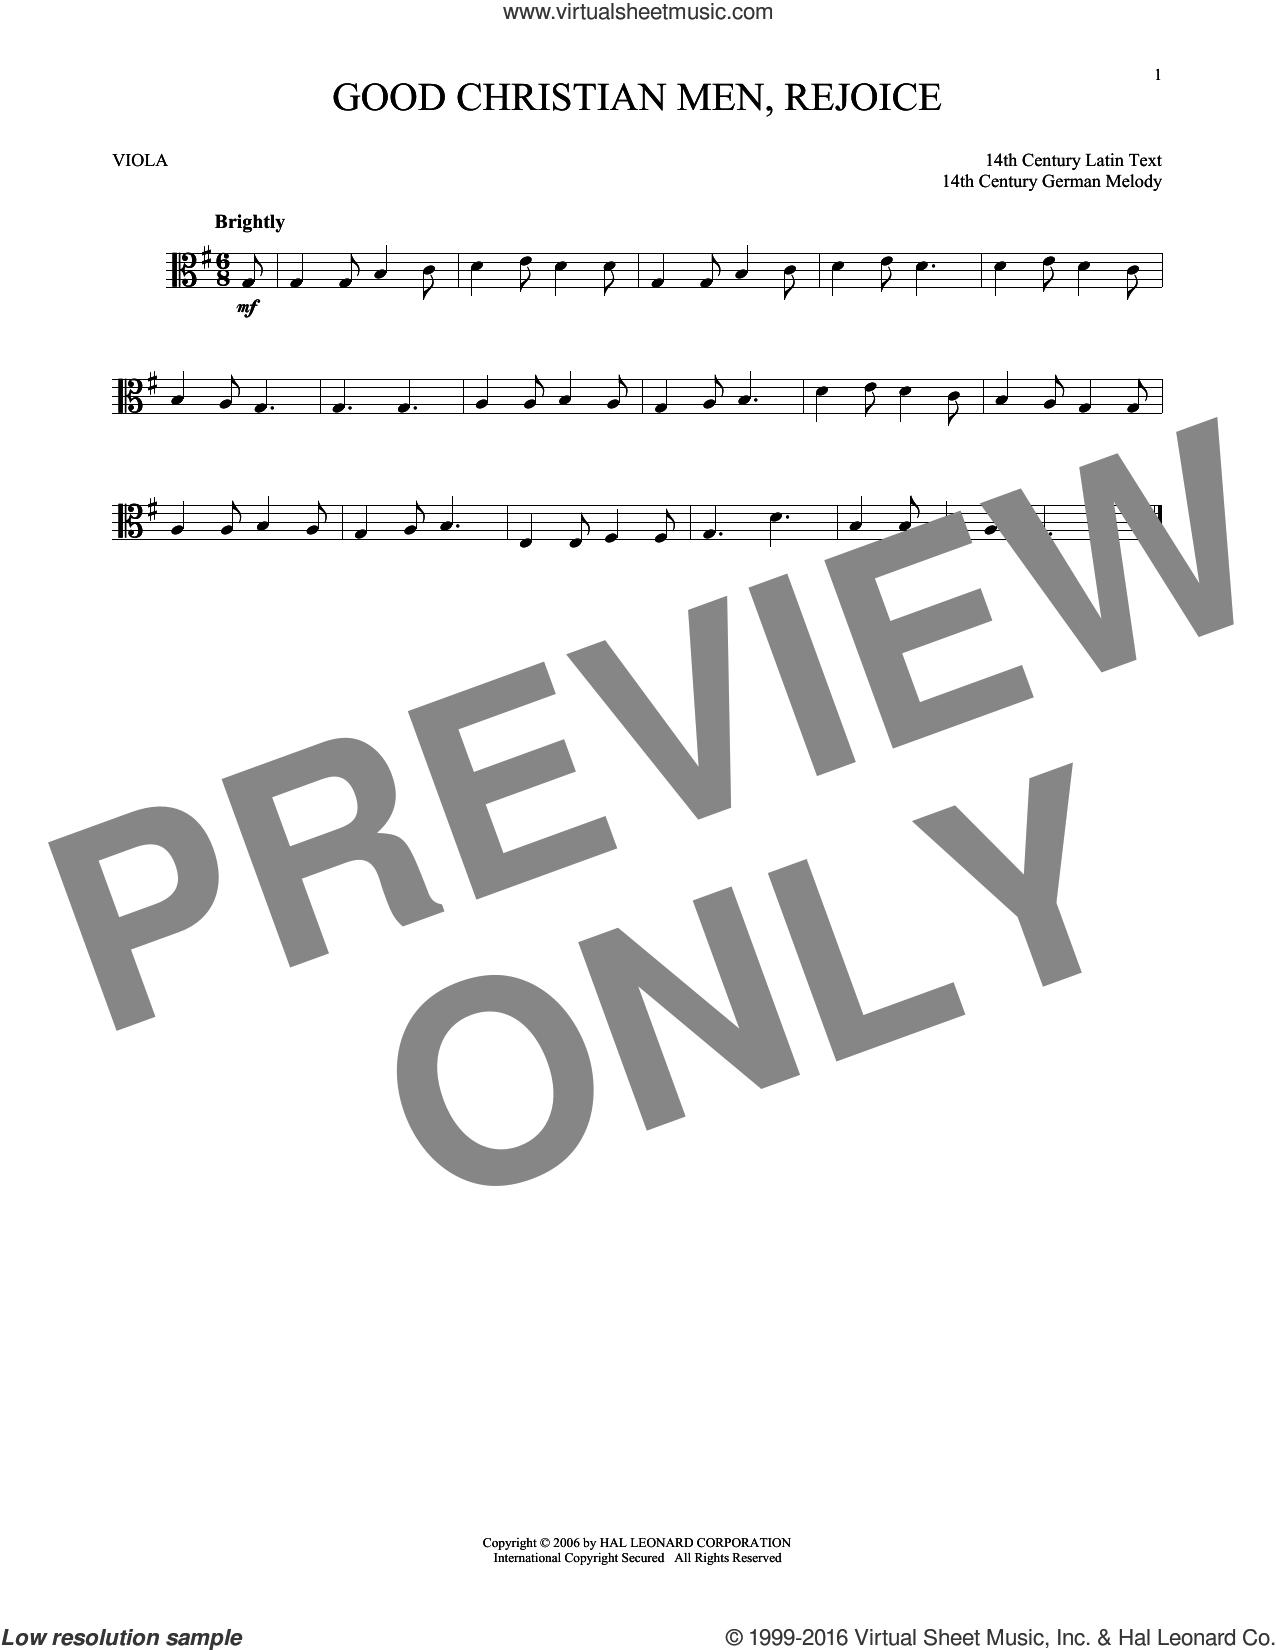 Good Christian Men, Rejoice sheet music for viola solo by John Mason Neale and Miscellaneous, intermediate skill level